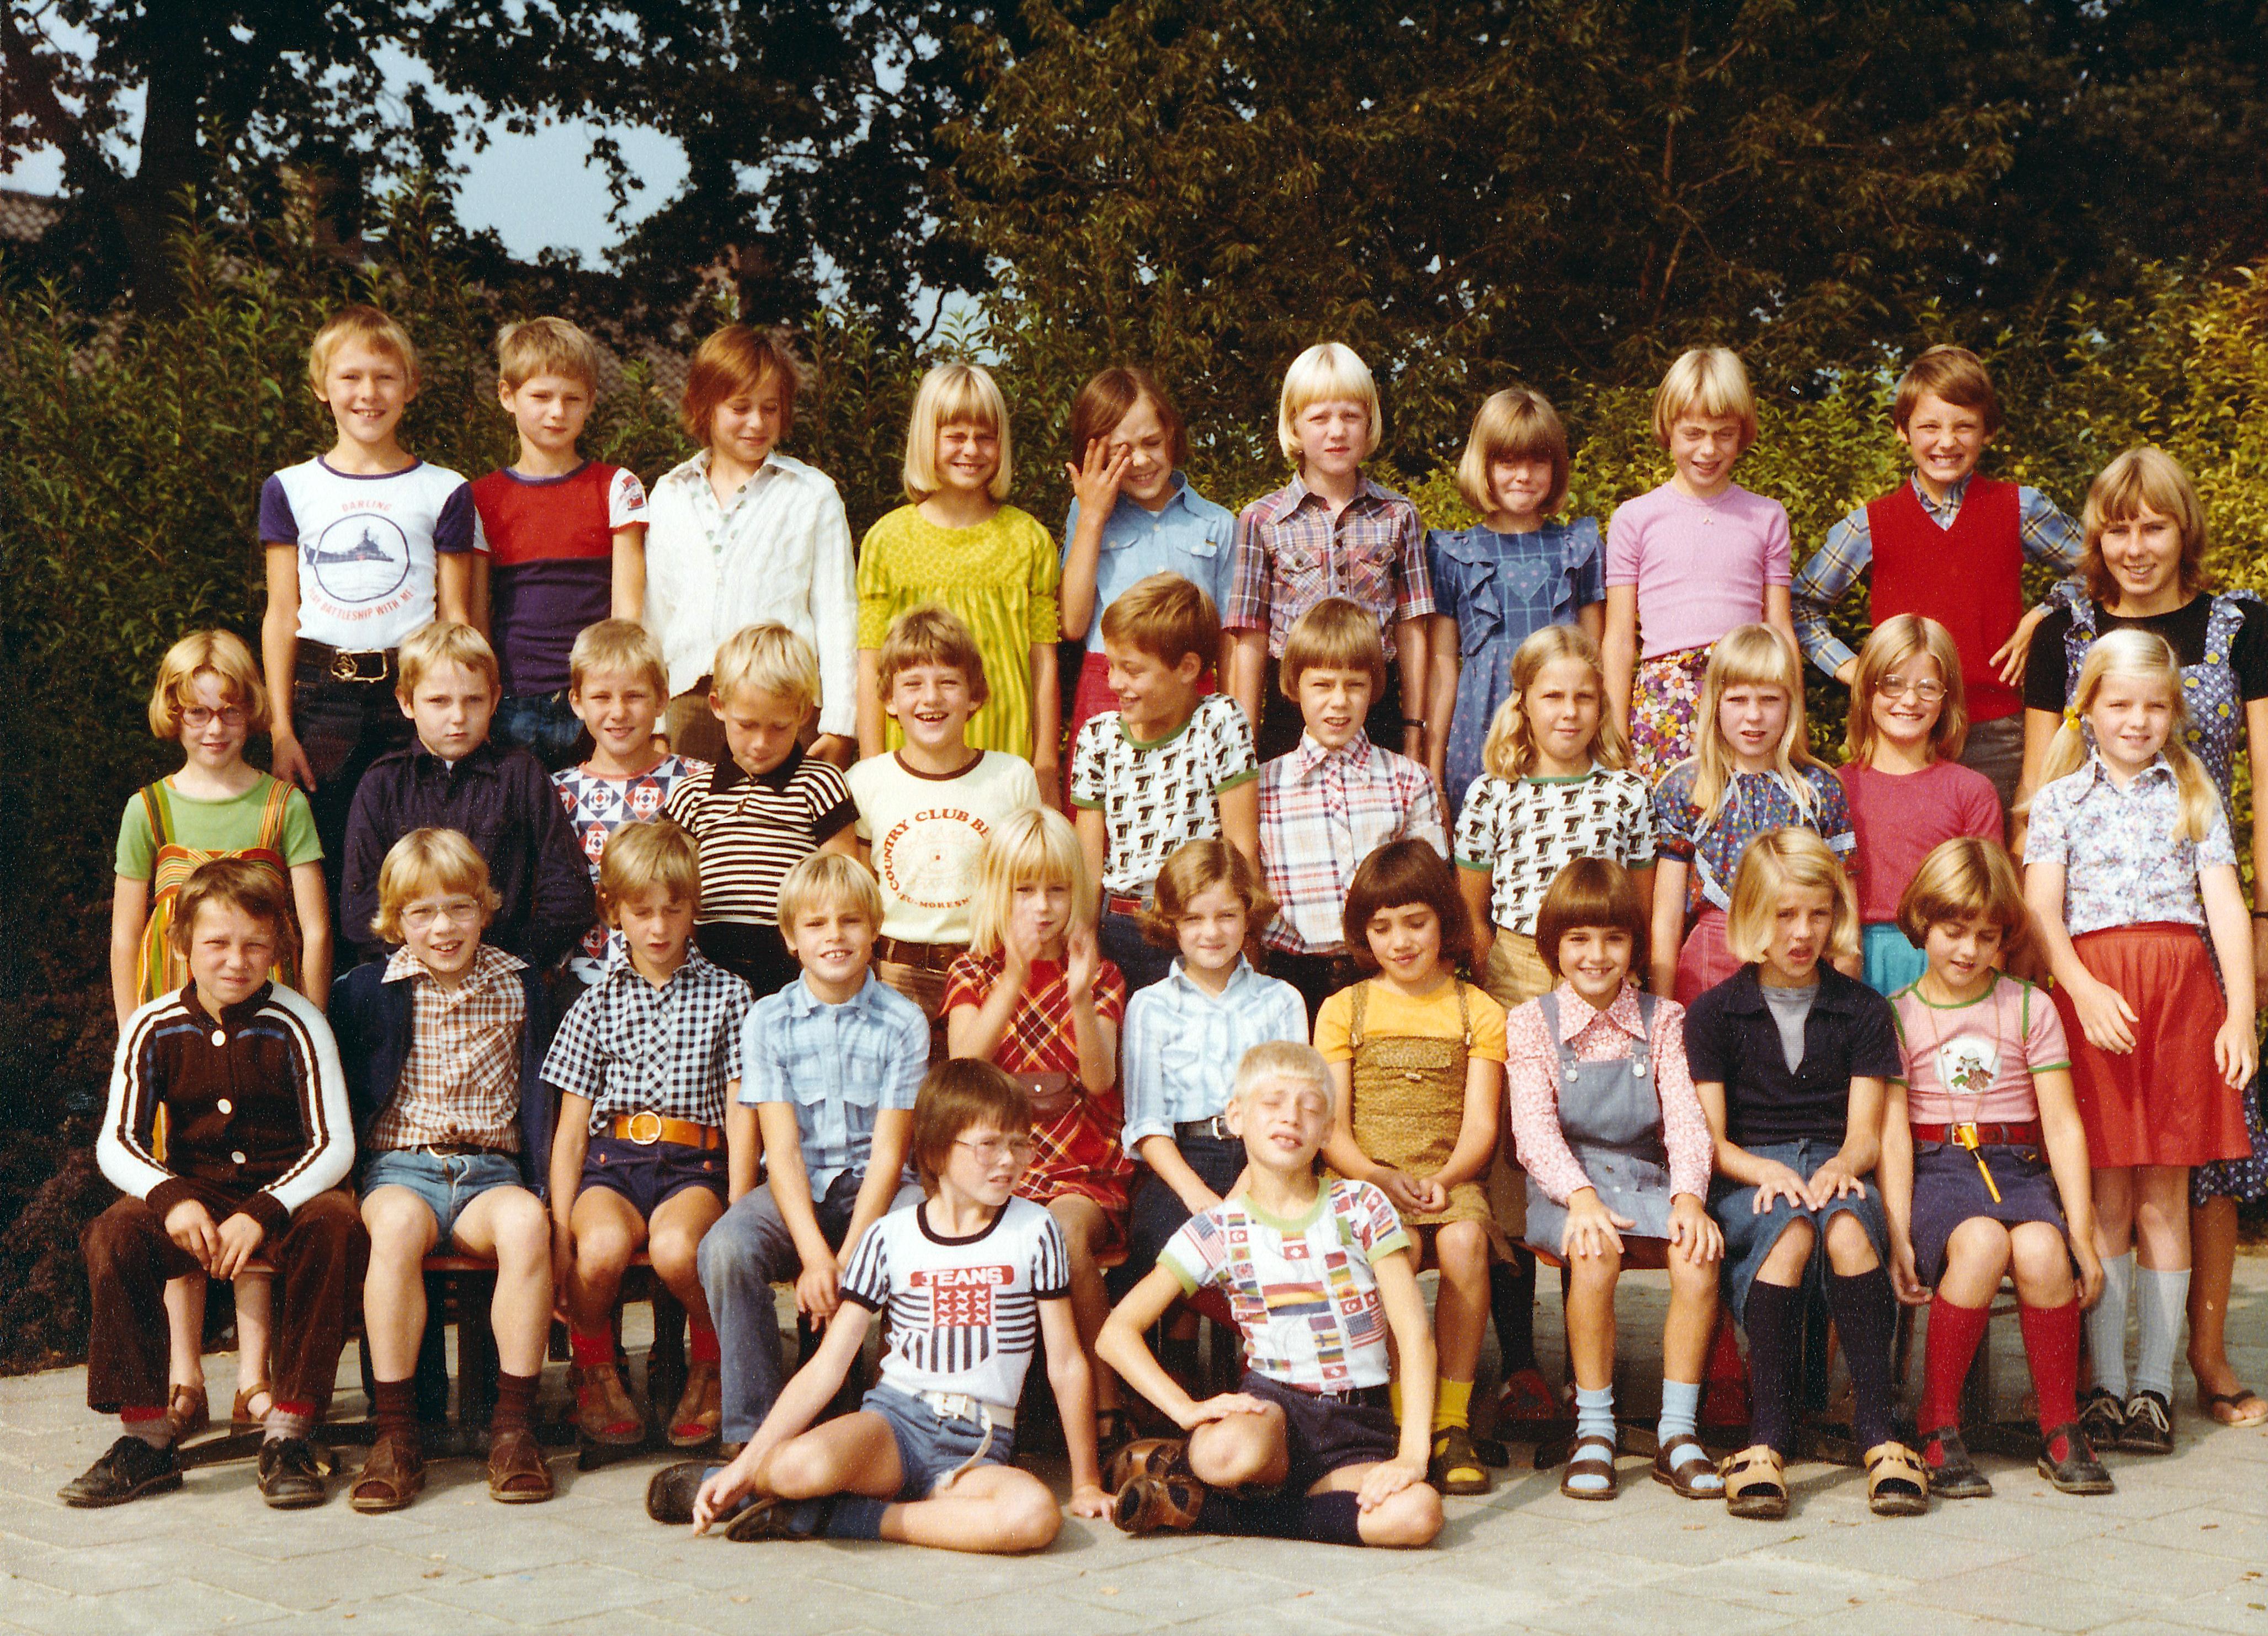 Dominee Bakkerschool foto